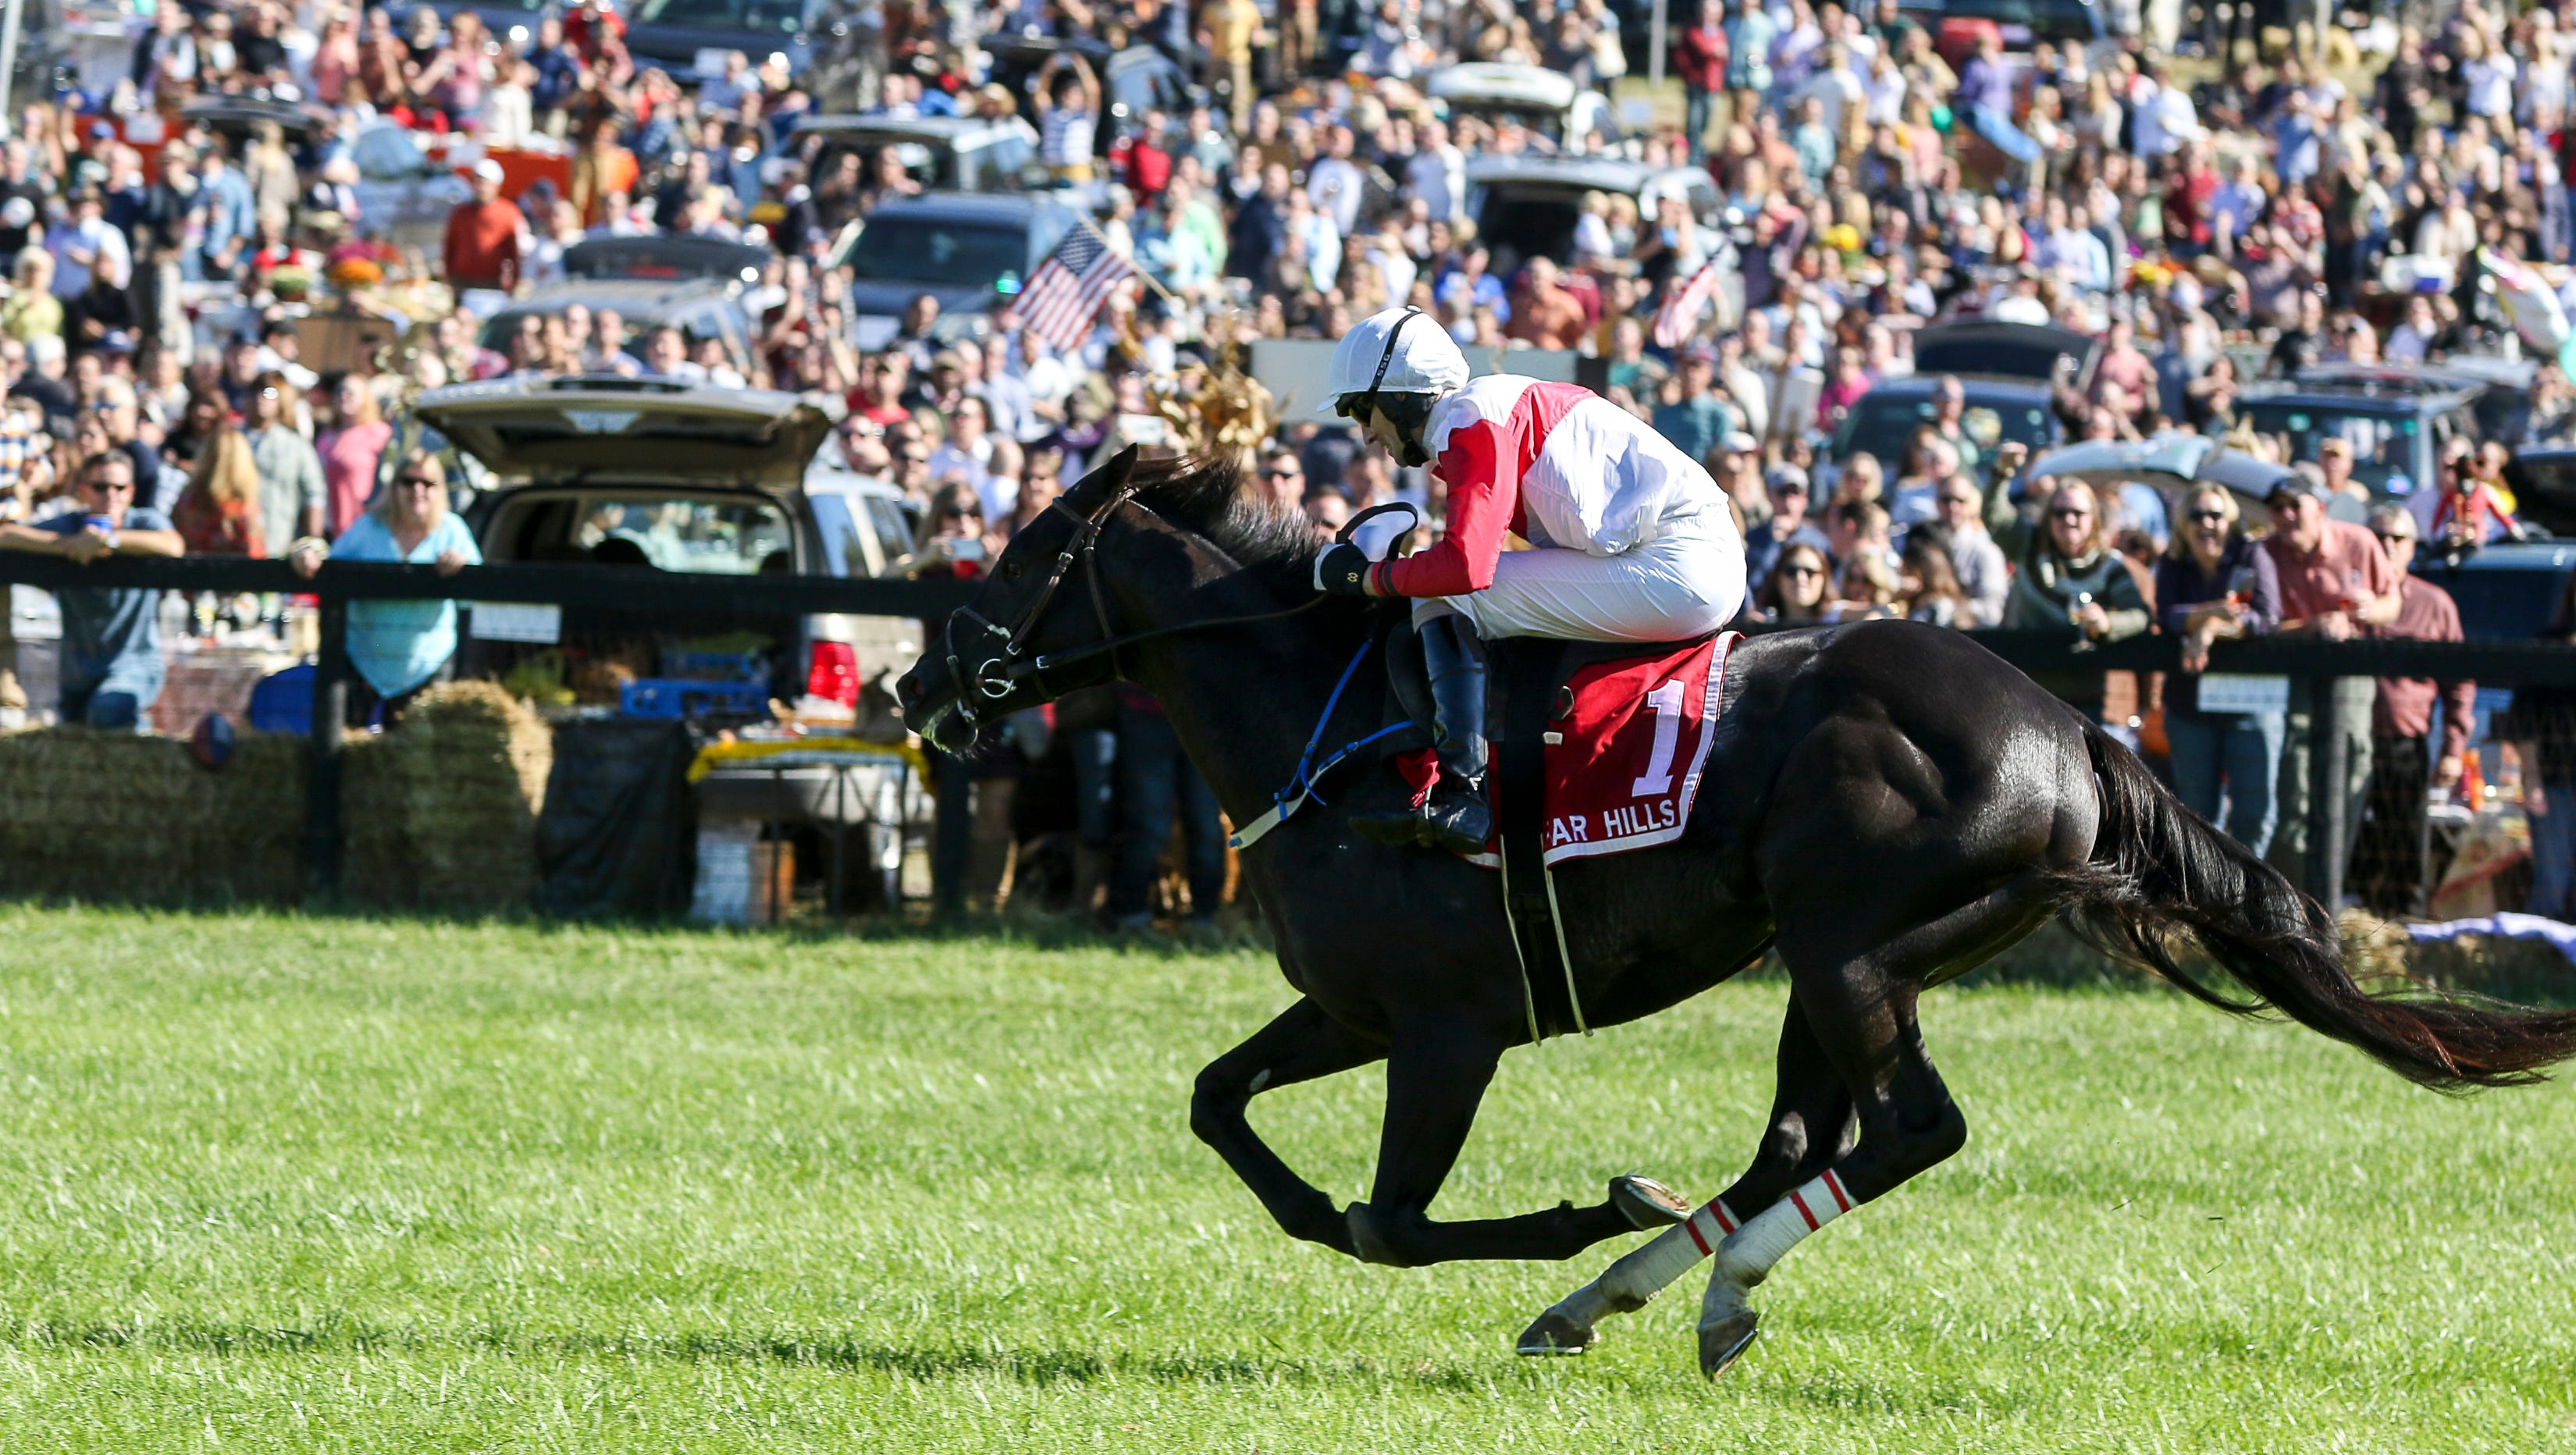 Far hills races betting line off track betting memphis tn zip